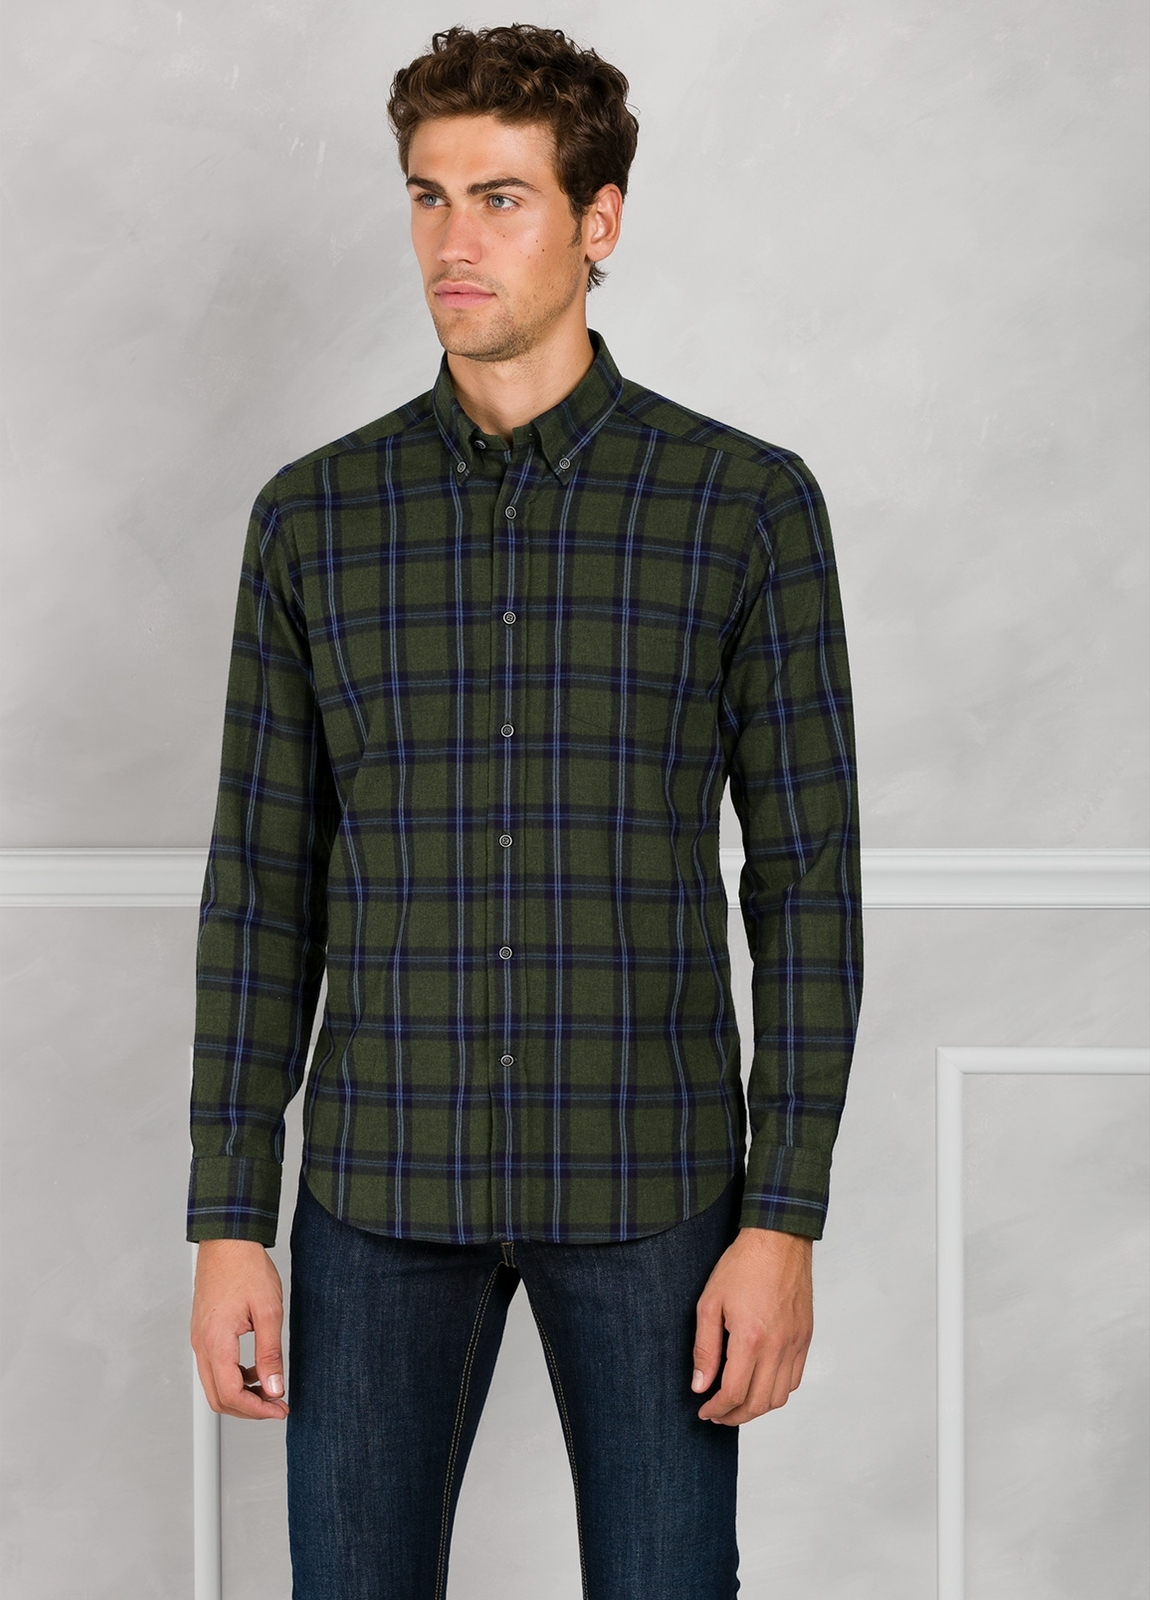 Camisa Leisure Wear REGULAR FIT Modelo BOTTON DOWN cuadros color verde. 100% Algodón.